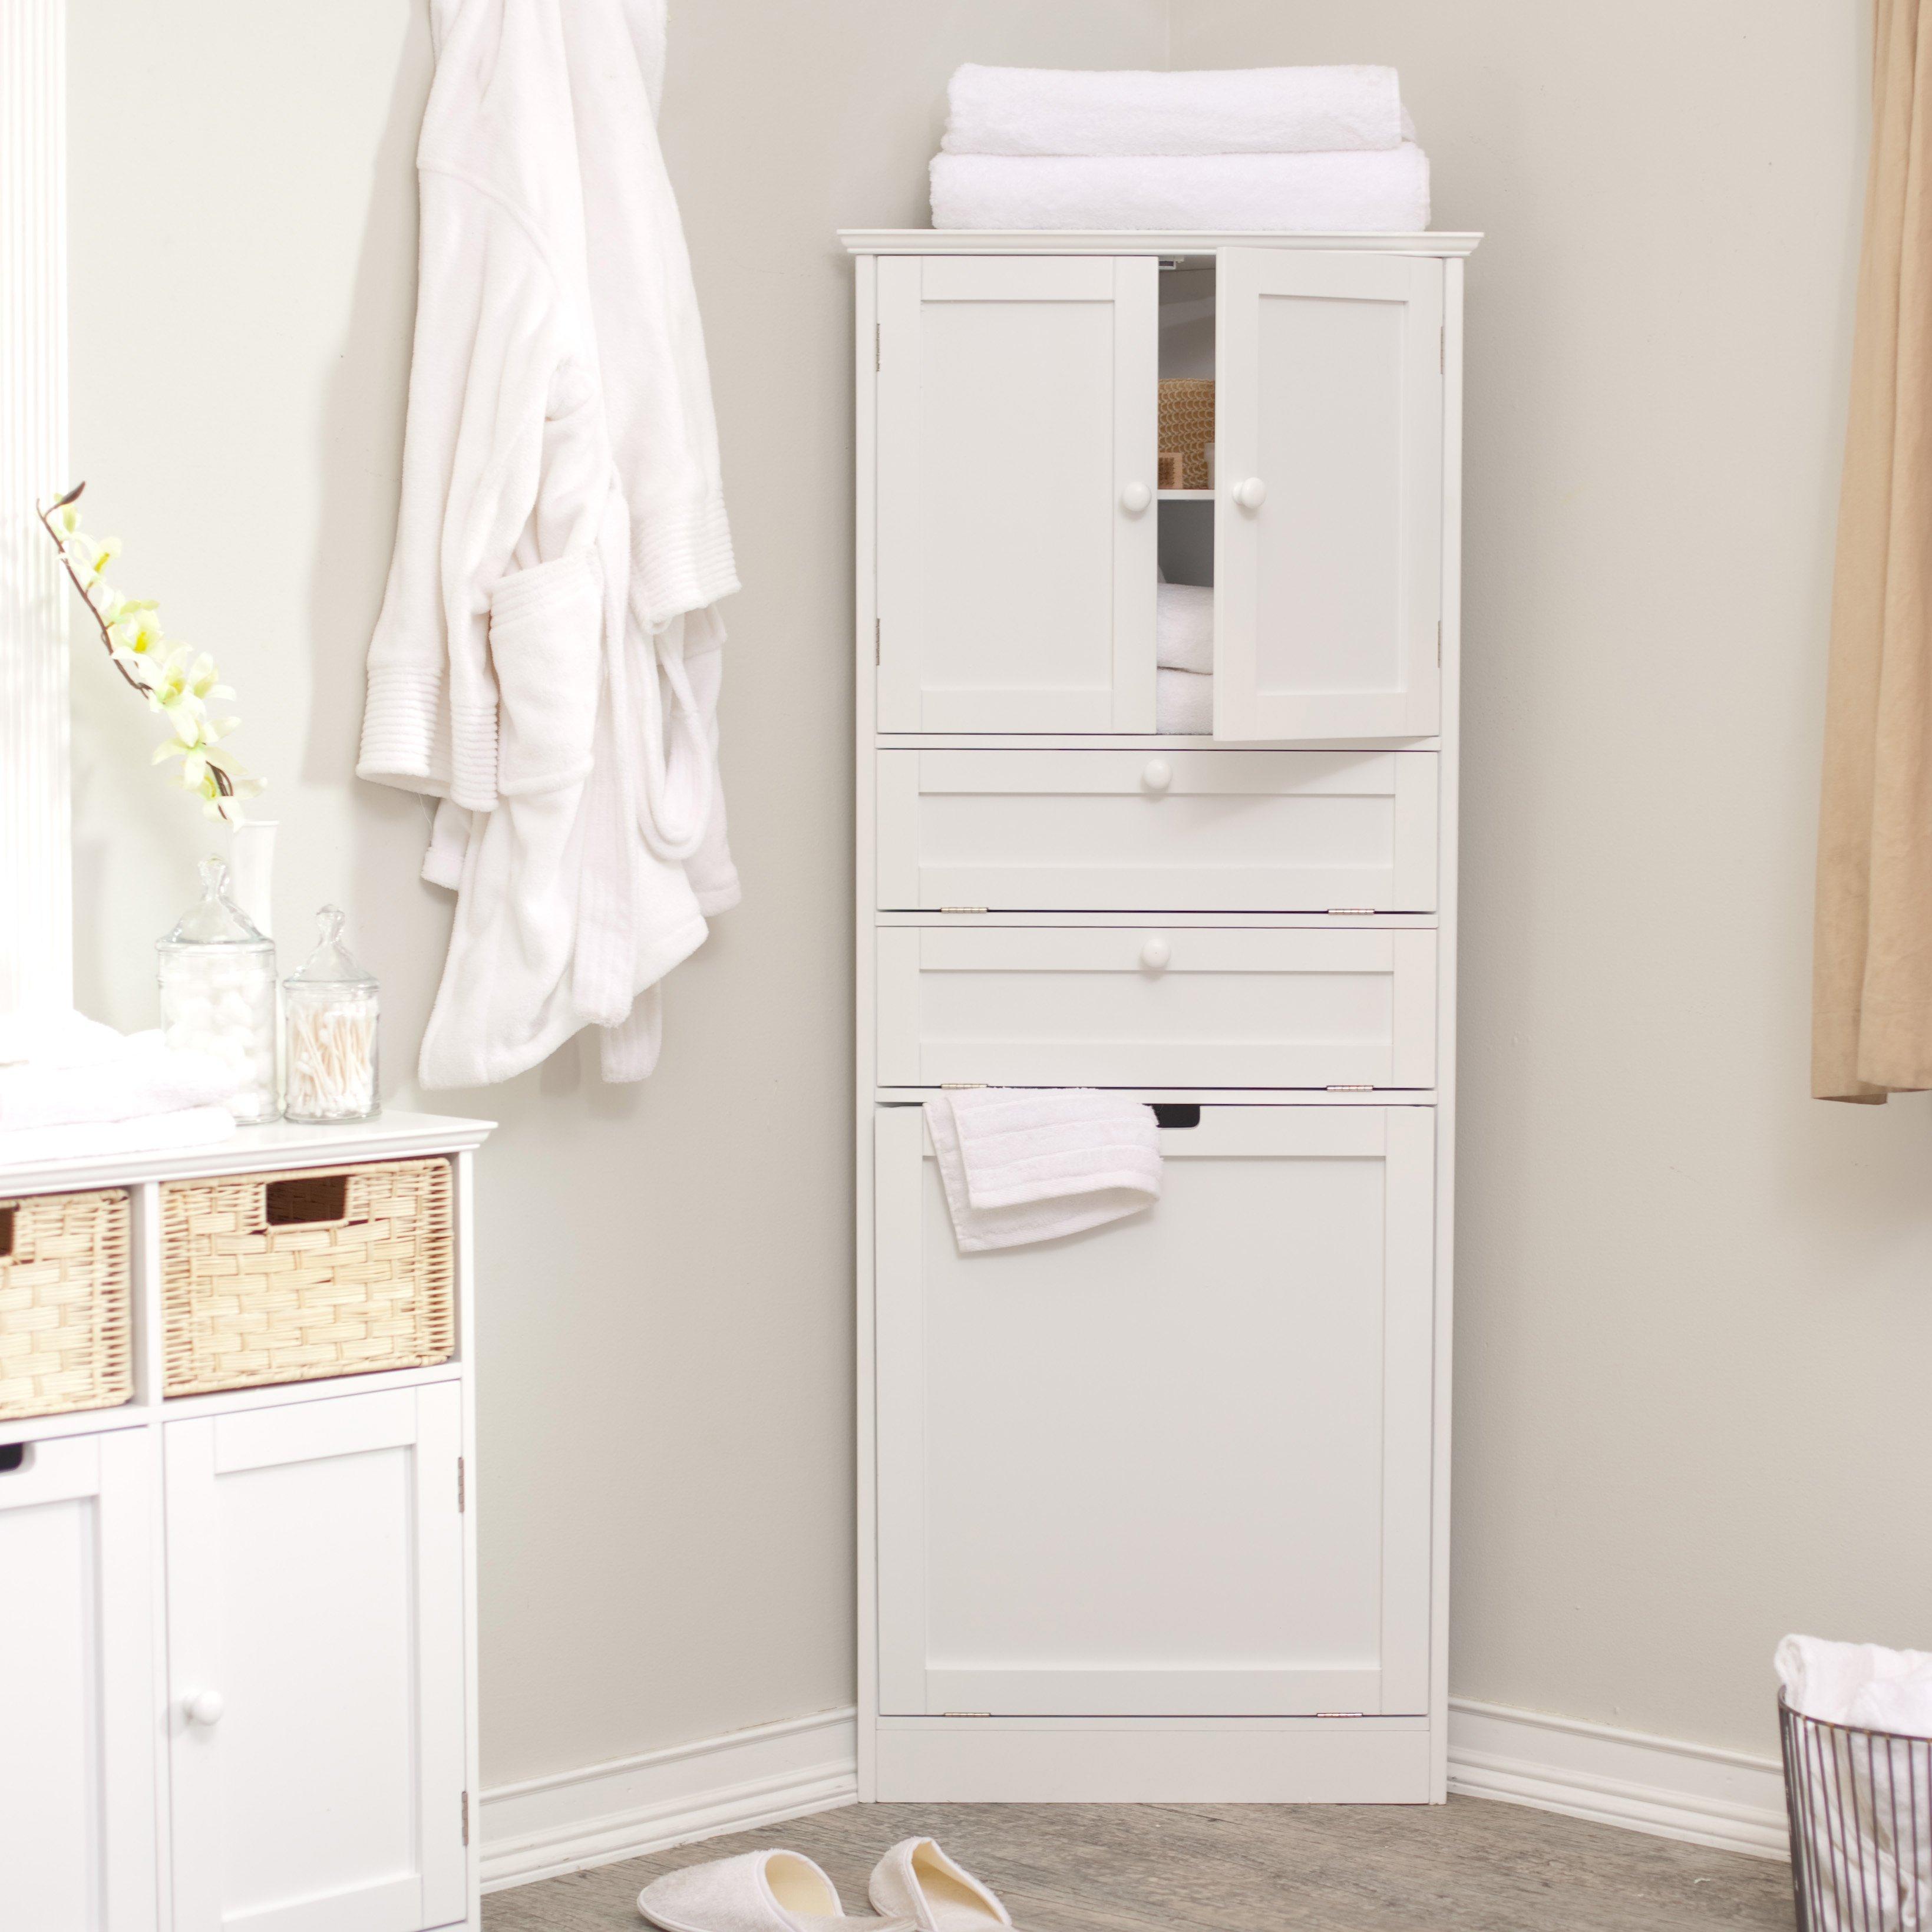 White Corner Bathroom Cabinet Cabinet Ideas in sizing 3279 X 3279